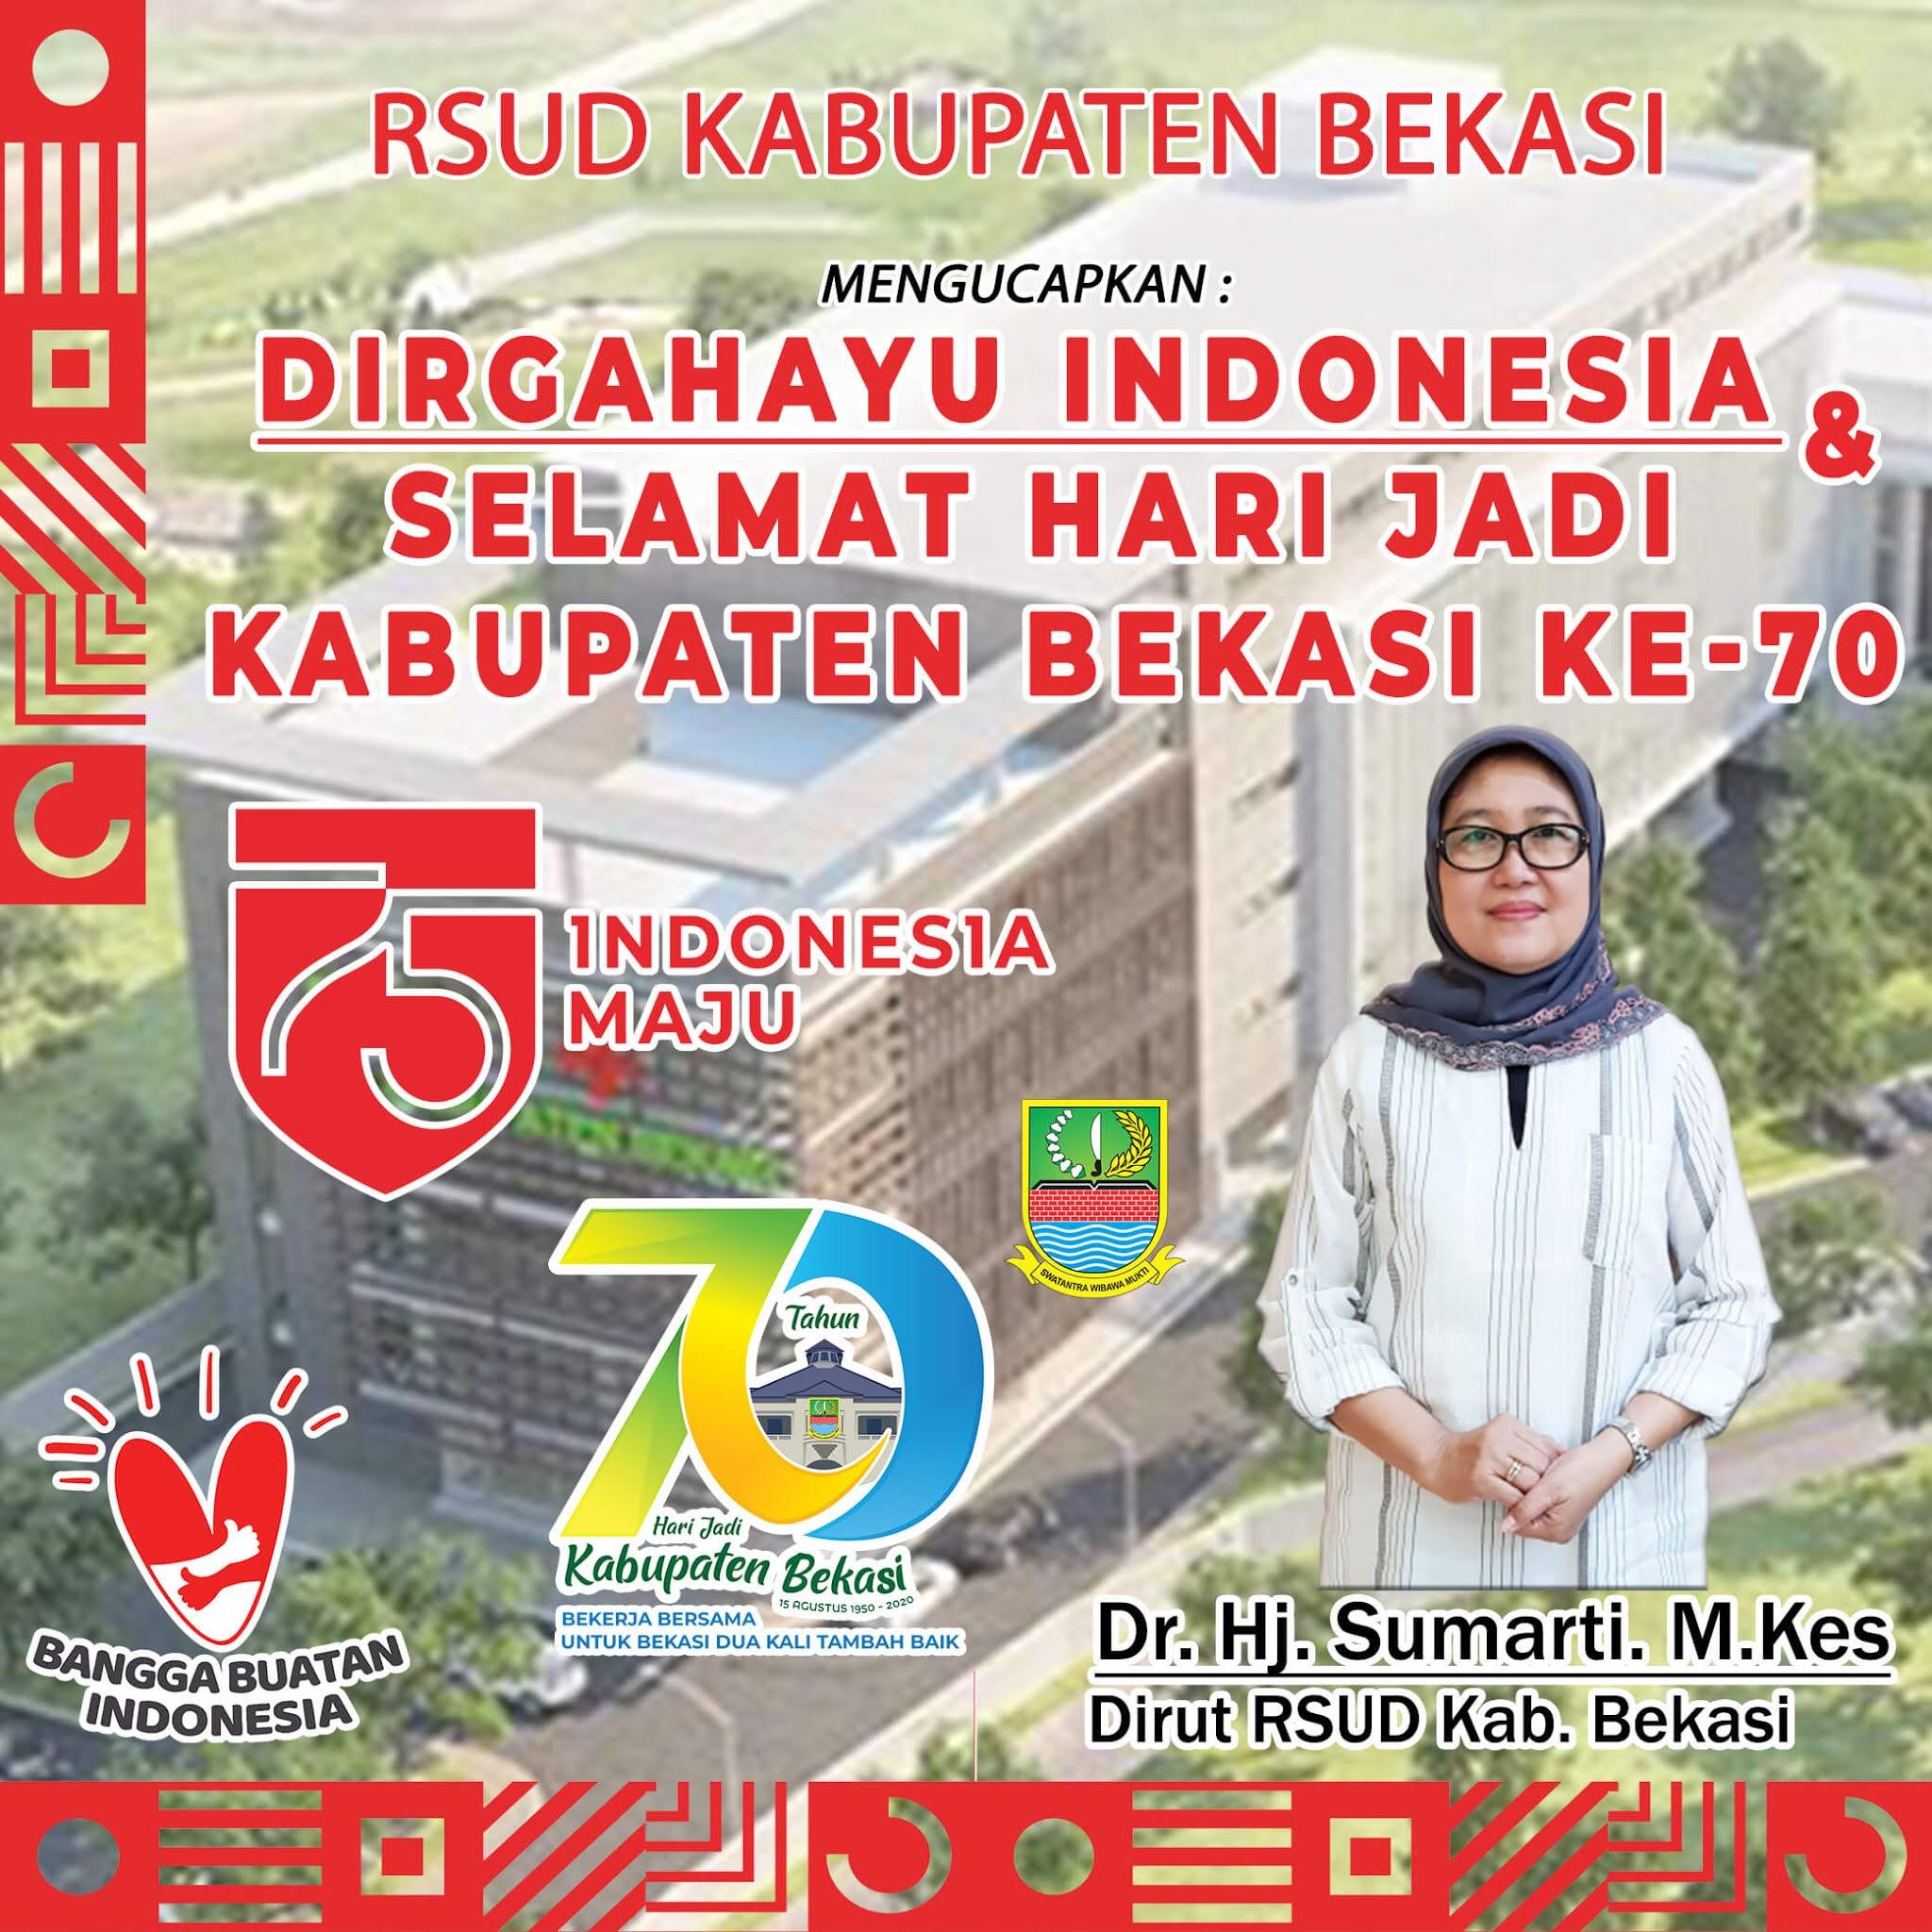 Dirut RSUD Kab. Bekasi Dr. Hj. Sumarti. M.Kes by LensaHukum.co.id